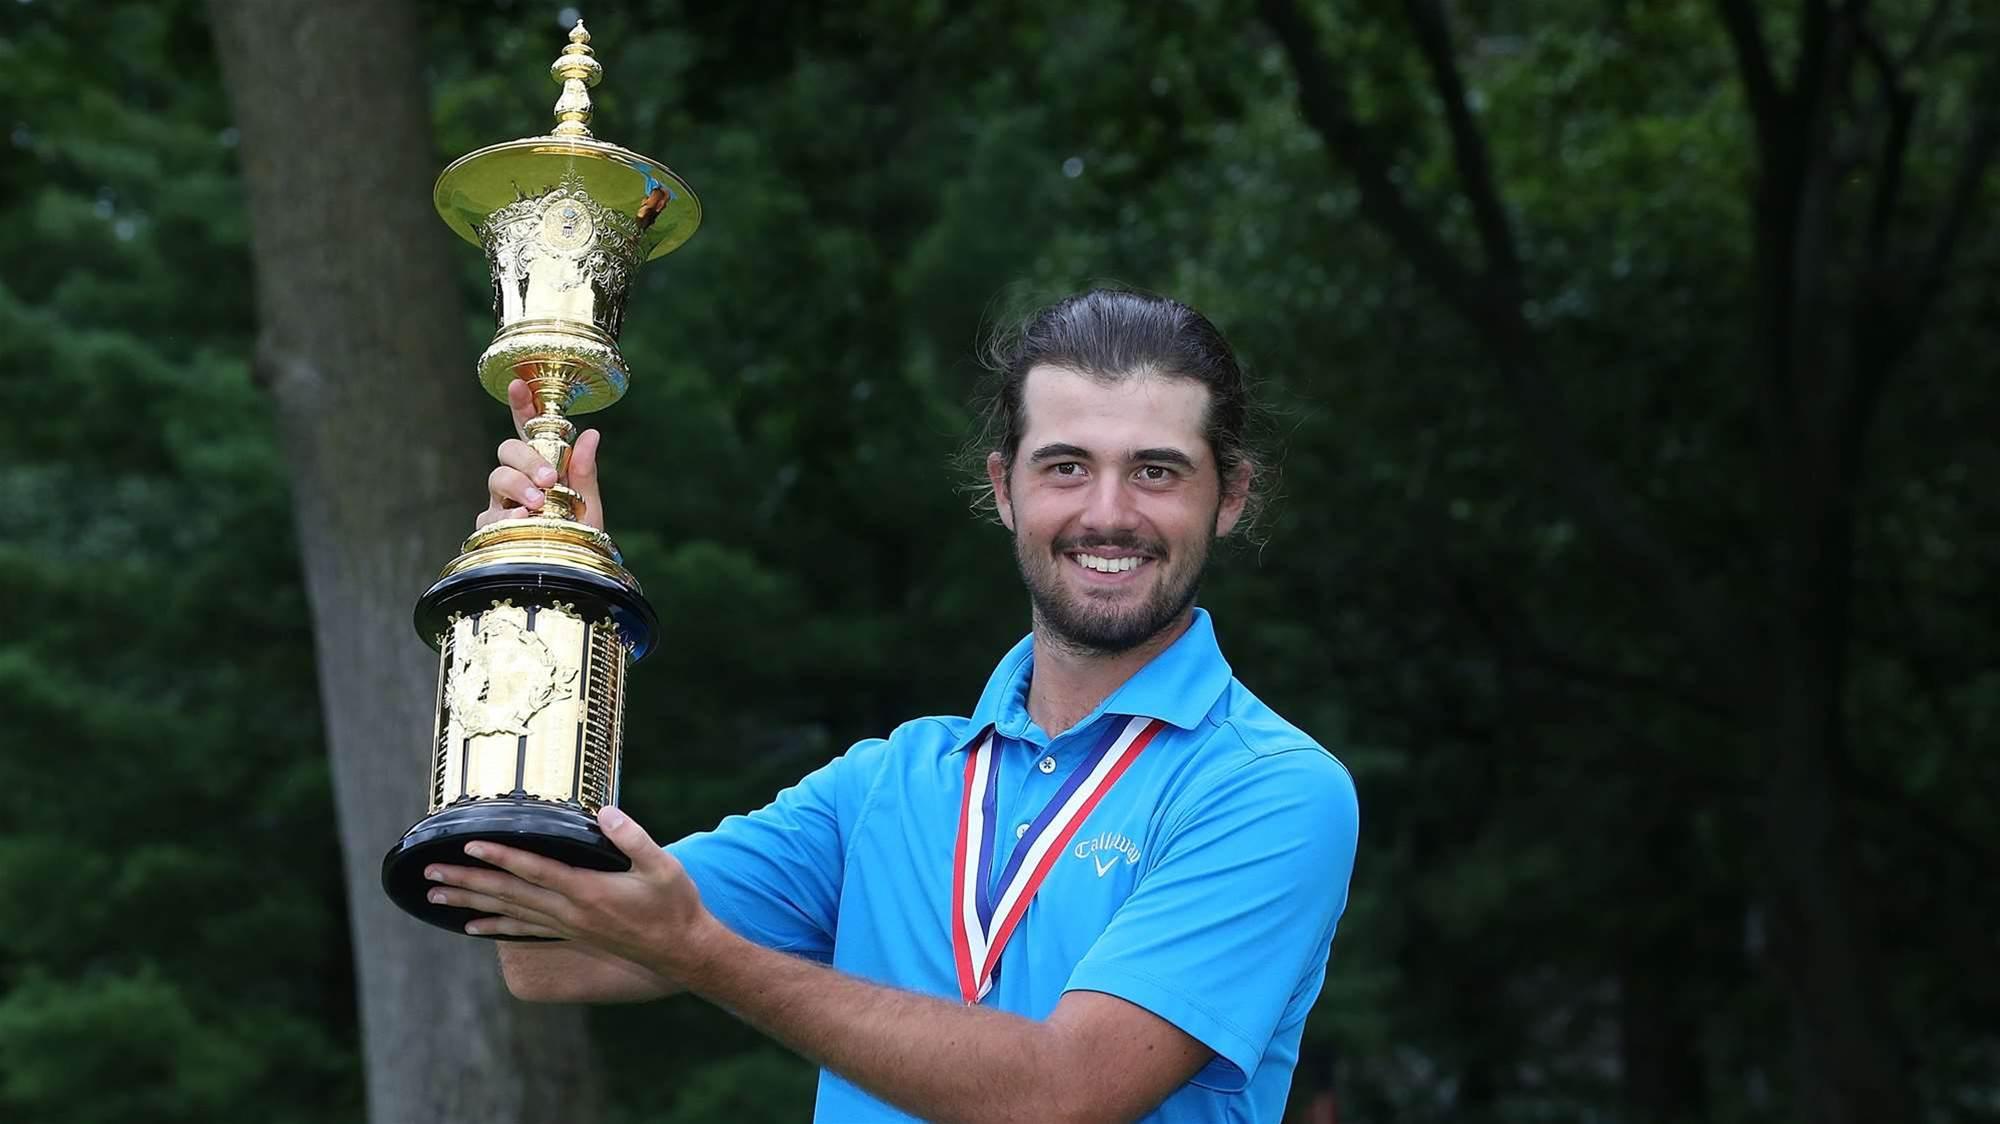 Aussie Curtis Luck wins prestigious U.S Amateur